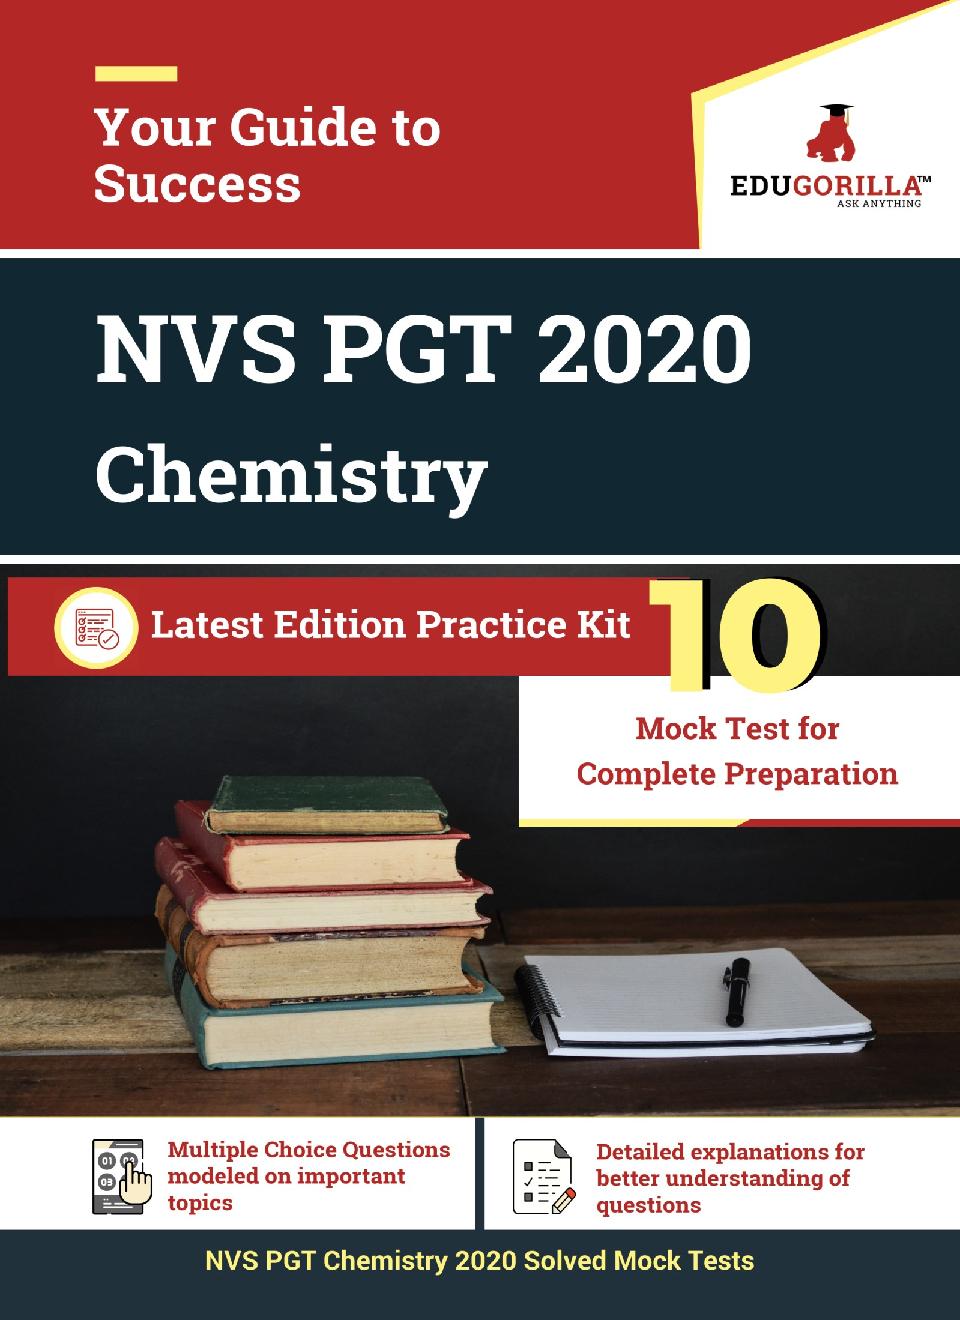 Edugorilla NVS PGT Chemistry 2020   10 Mock Test For Complete Preparation - Page 1